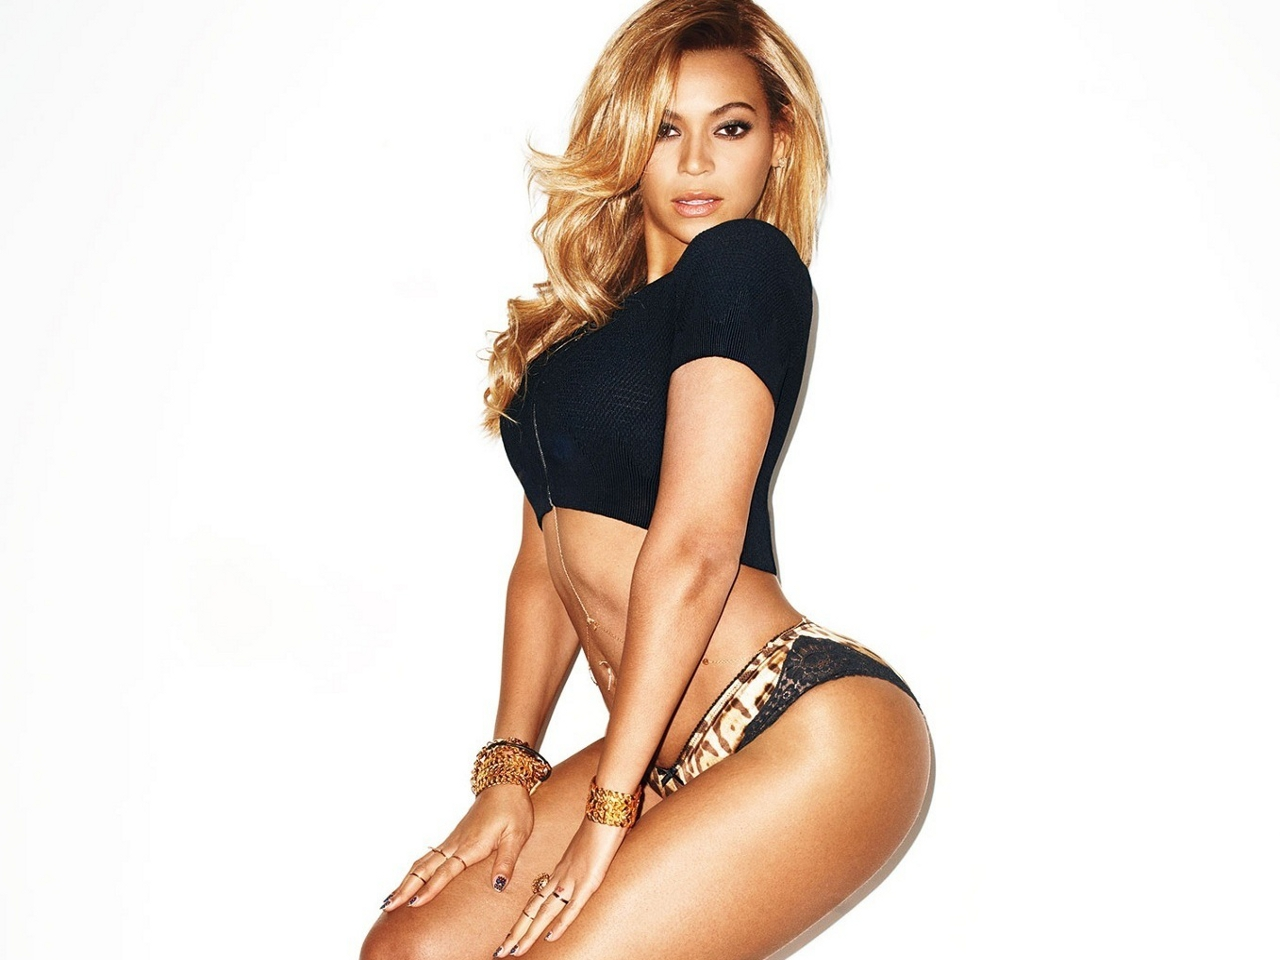 Beyonce-GQ-2013-beyonce-33279195-1280-960